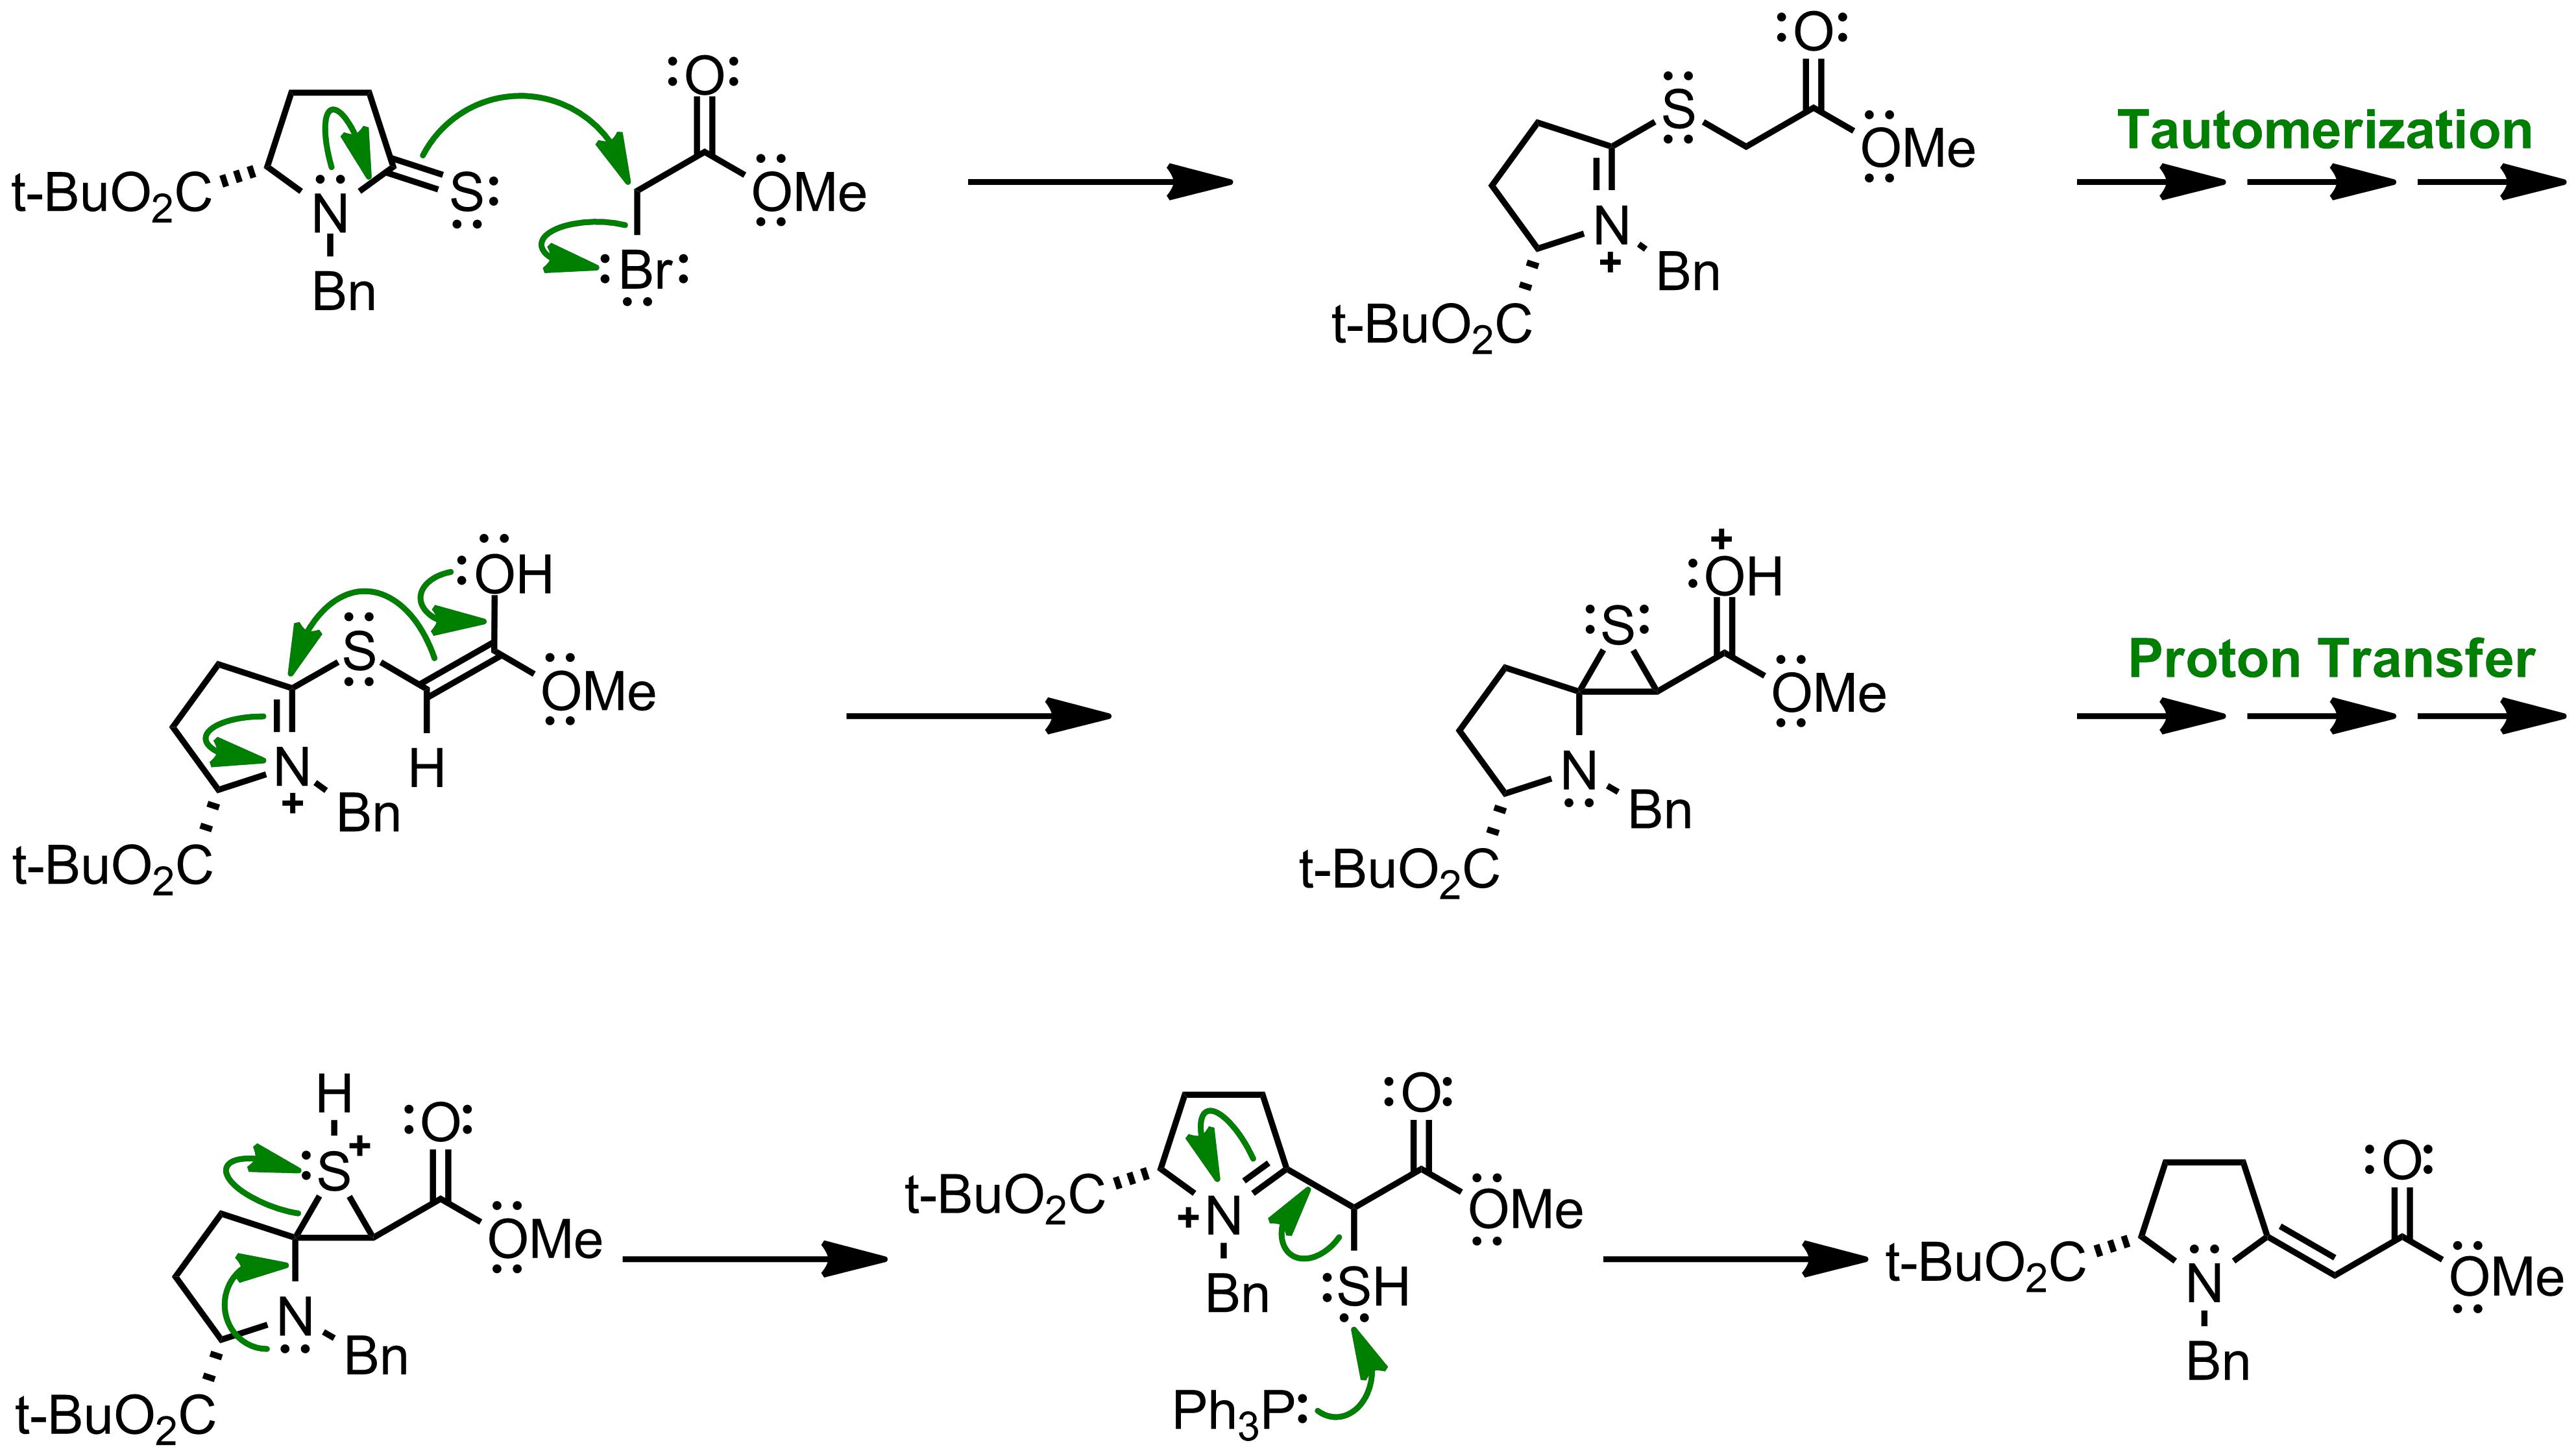 Mechanism of the Eschenmoser Sulfide Contraction